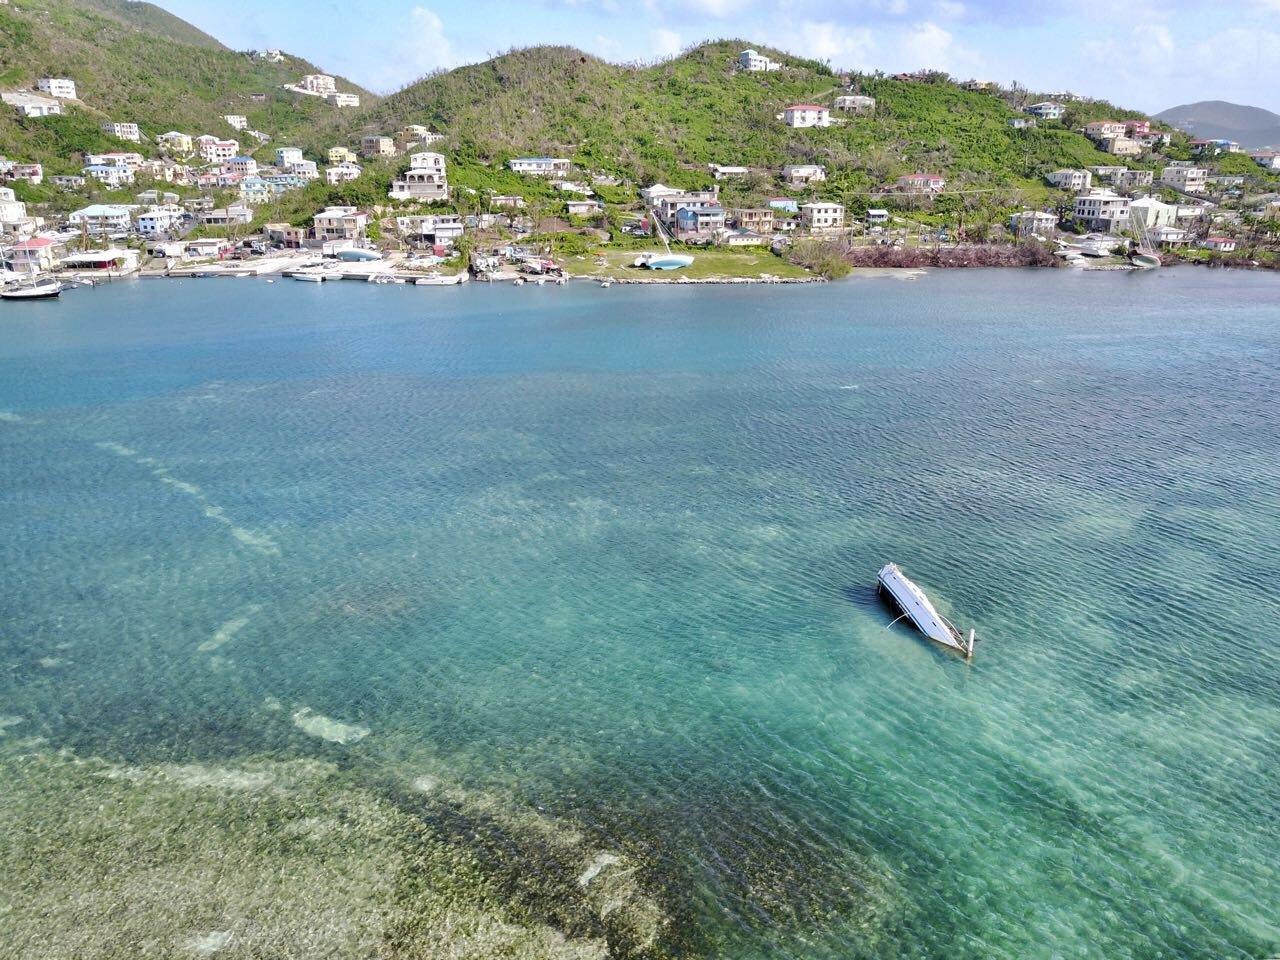 East End Harbour in Tortola - photo by Alton Bertie